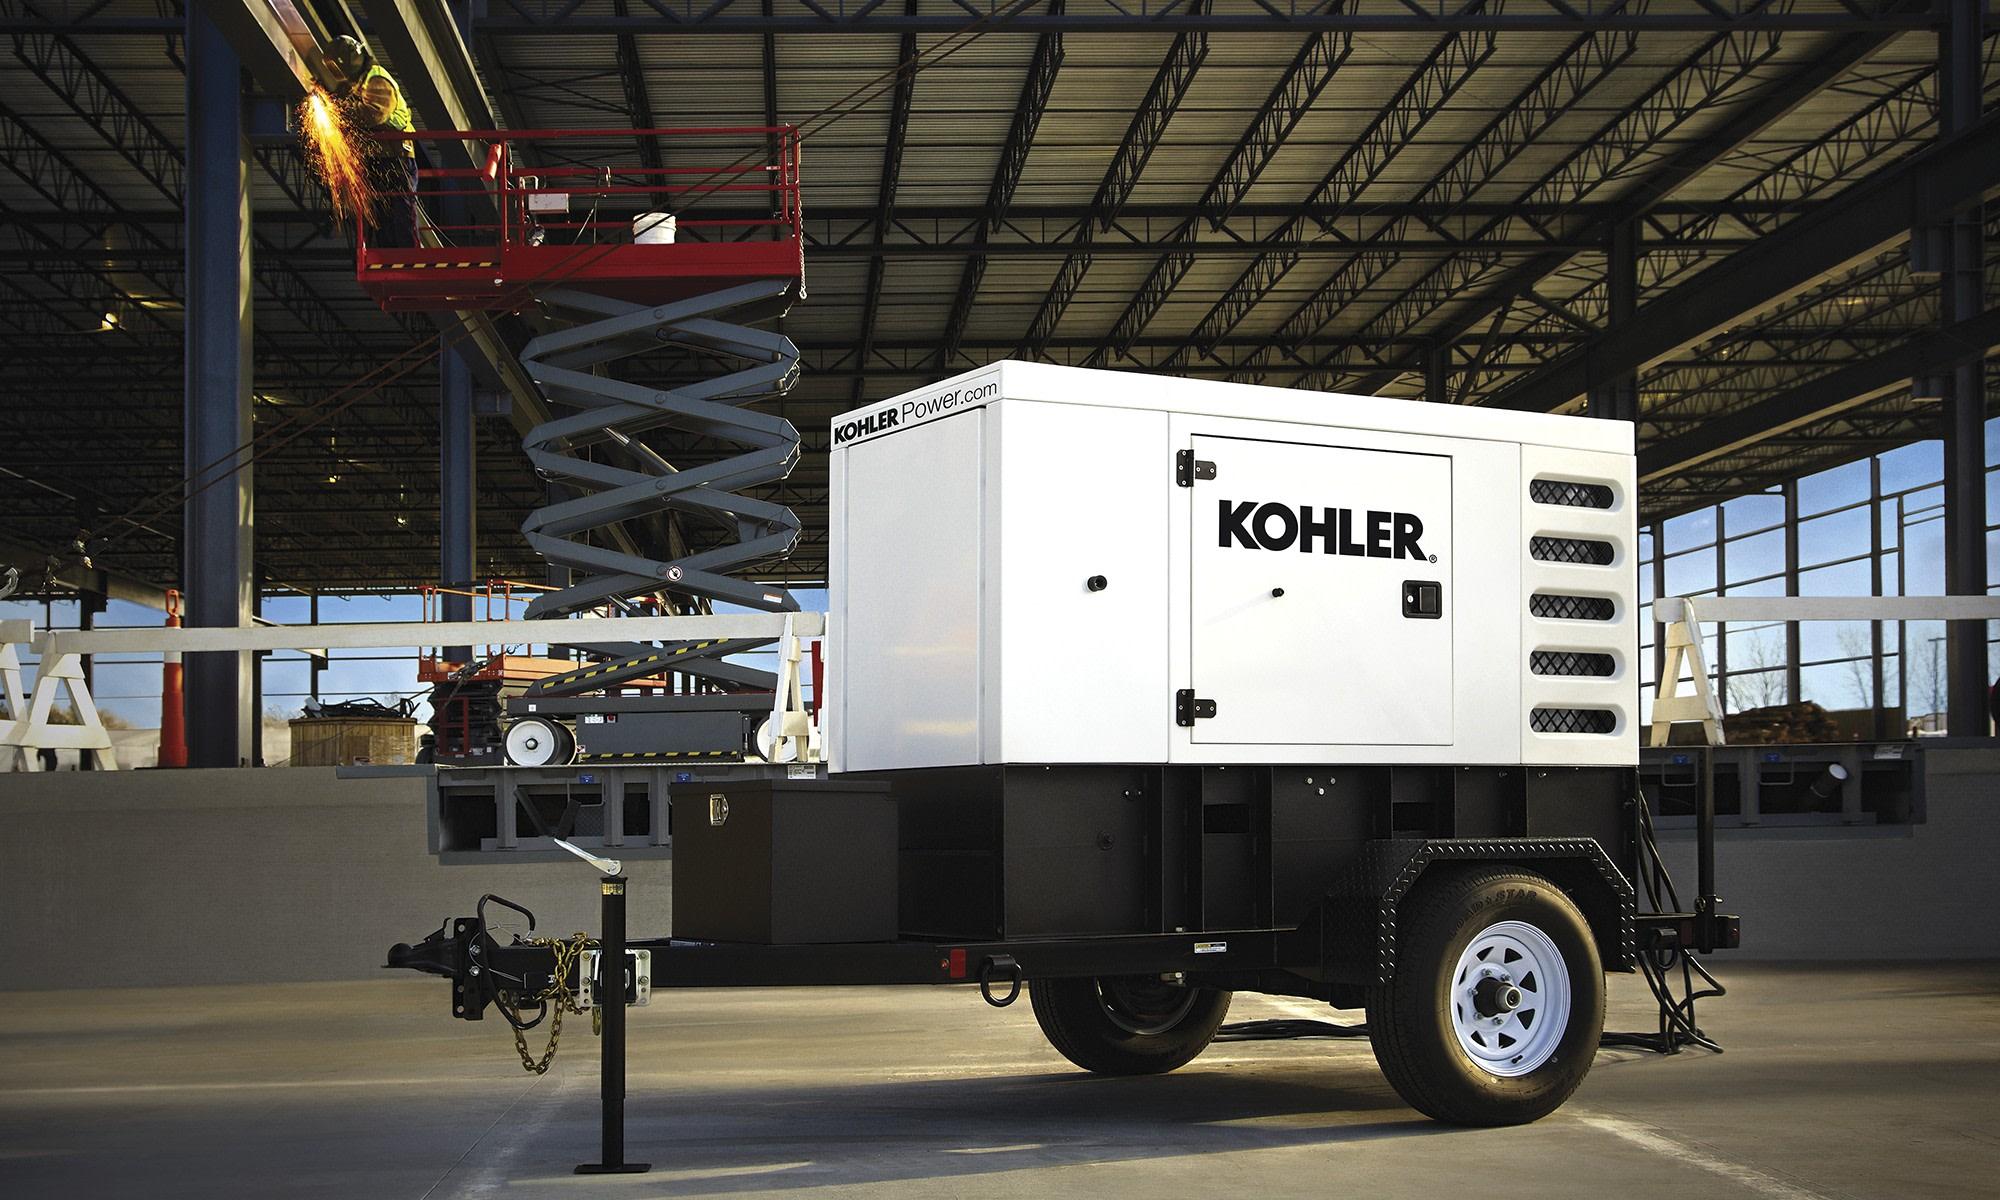 Kohler Mobile and Towable Generators